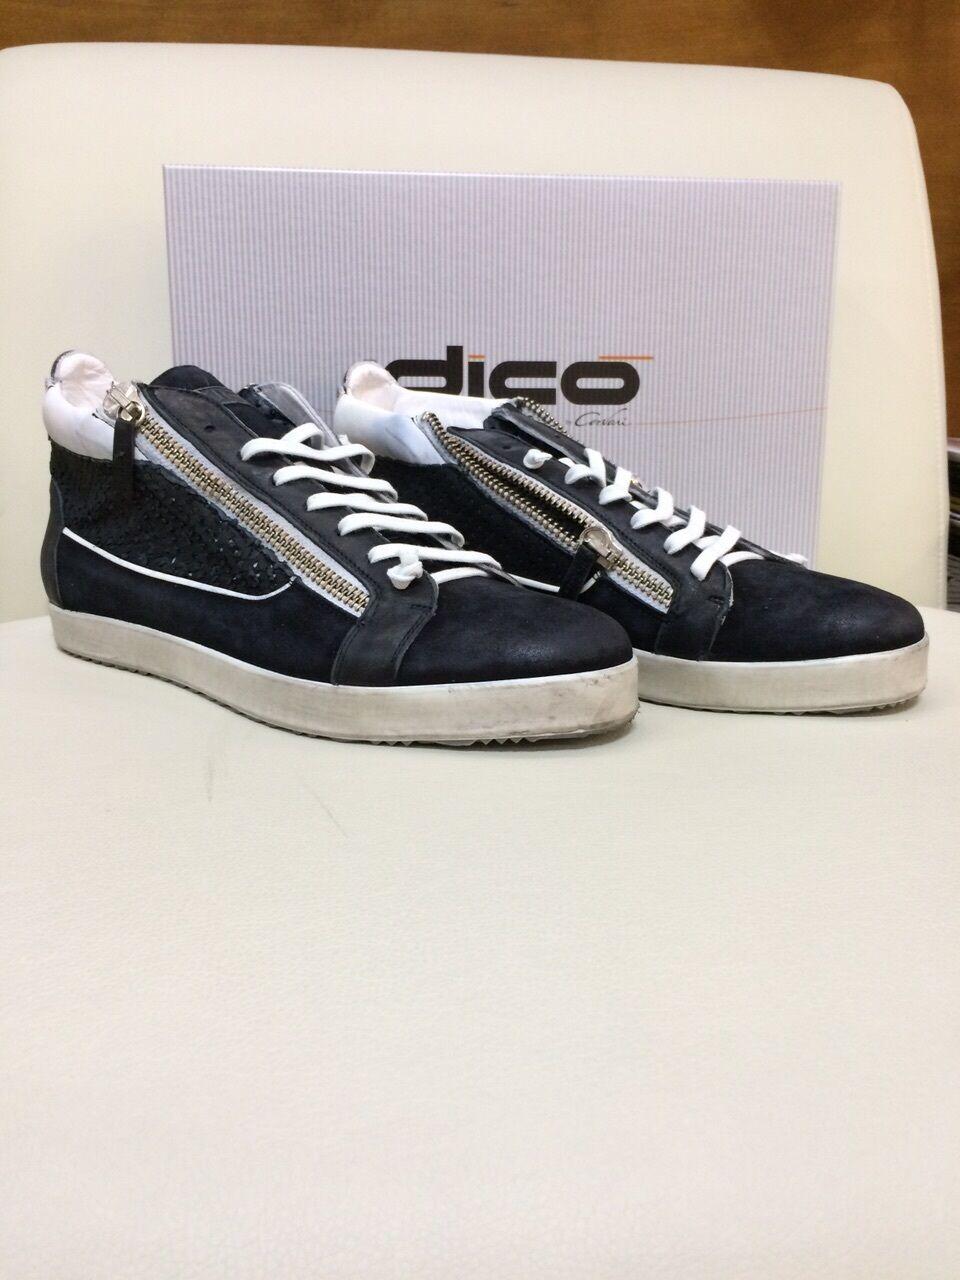 Scarpa sneaker DICO by CORVARI Mod.1971 sconto -30%